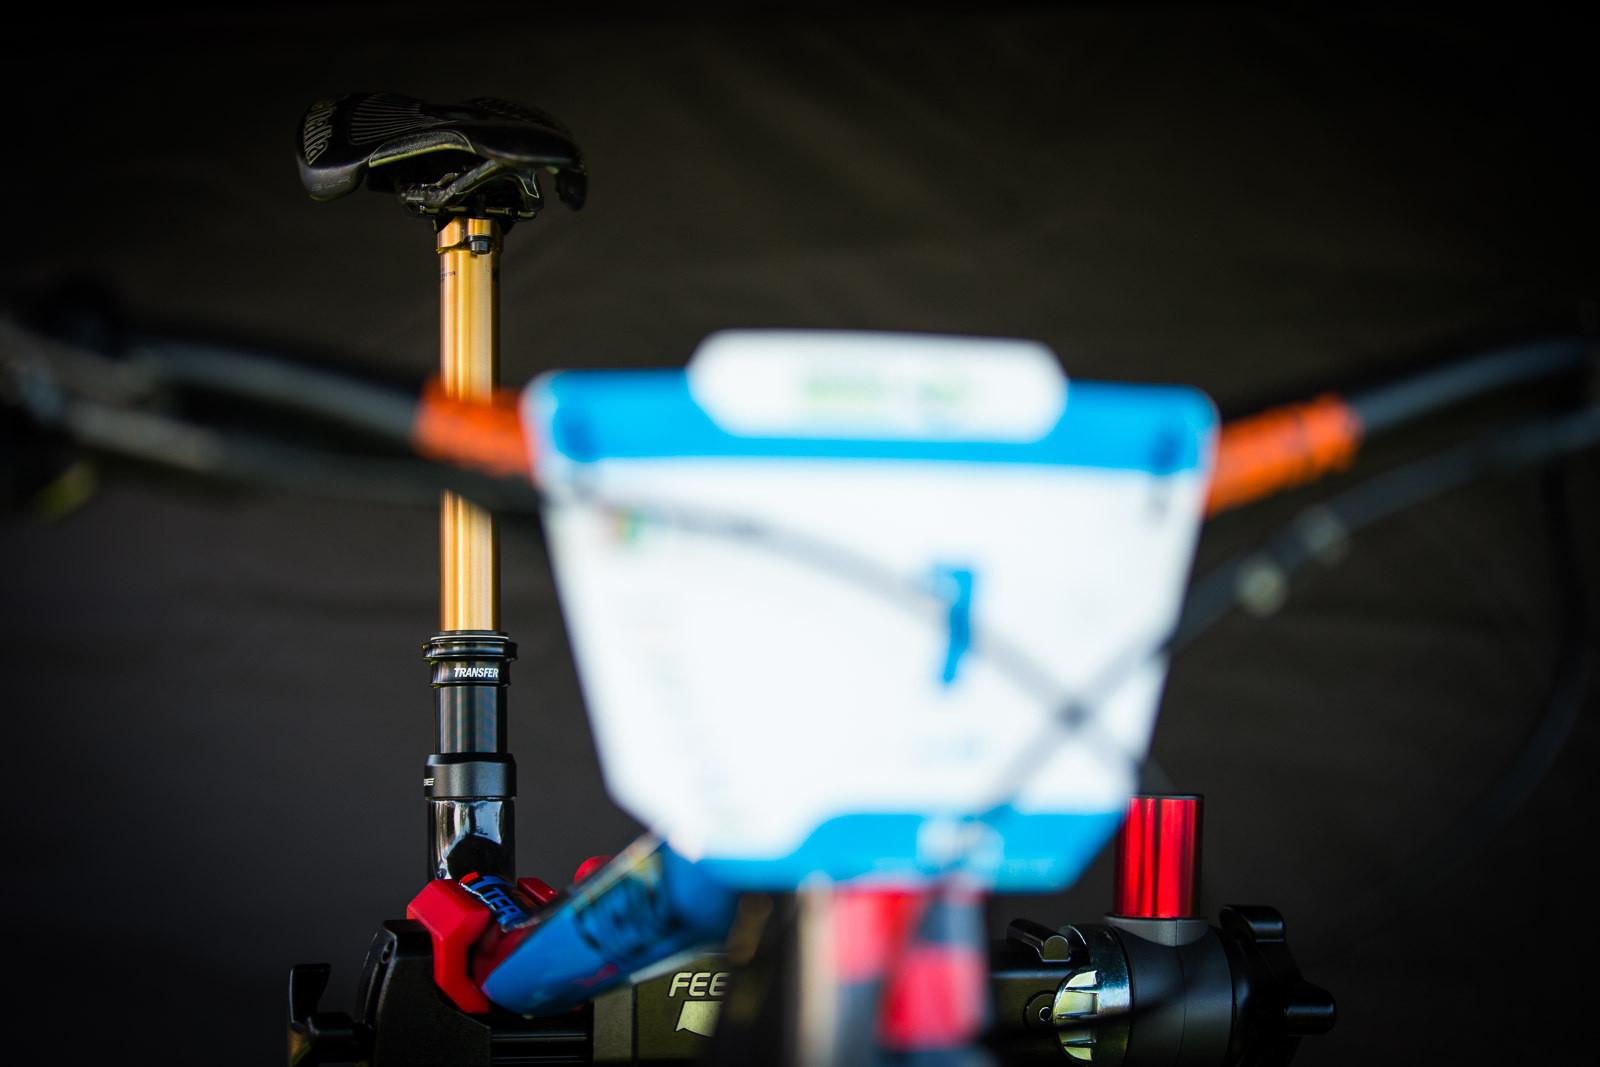 FOX Transfer Dropper Seatpost - PIT BITS - Enduro World Series, Wicklow, Ireland - Mountain Biking Pictures - Vital MTB